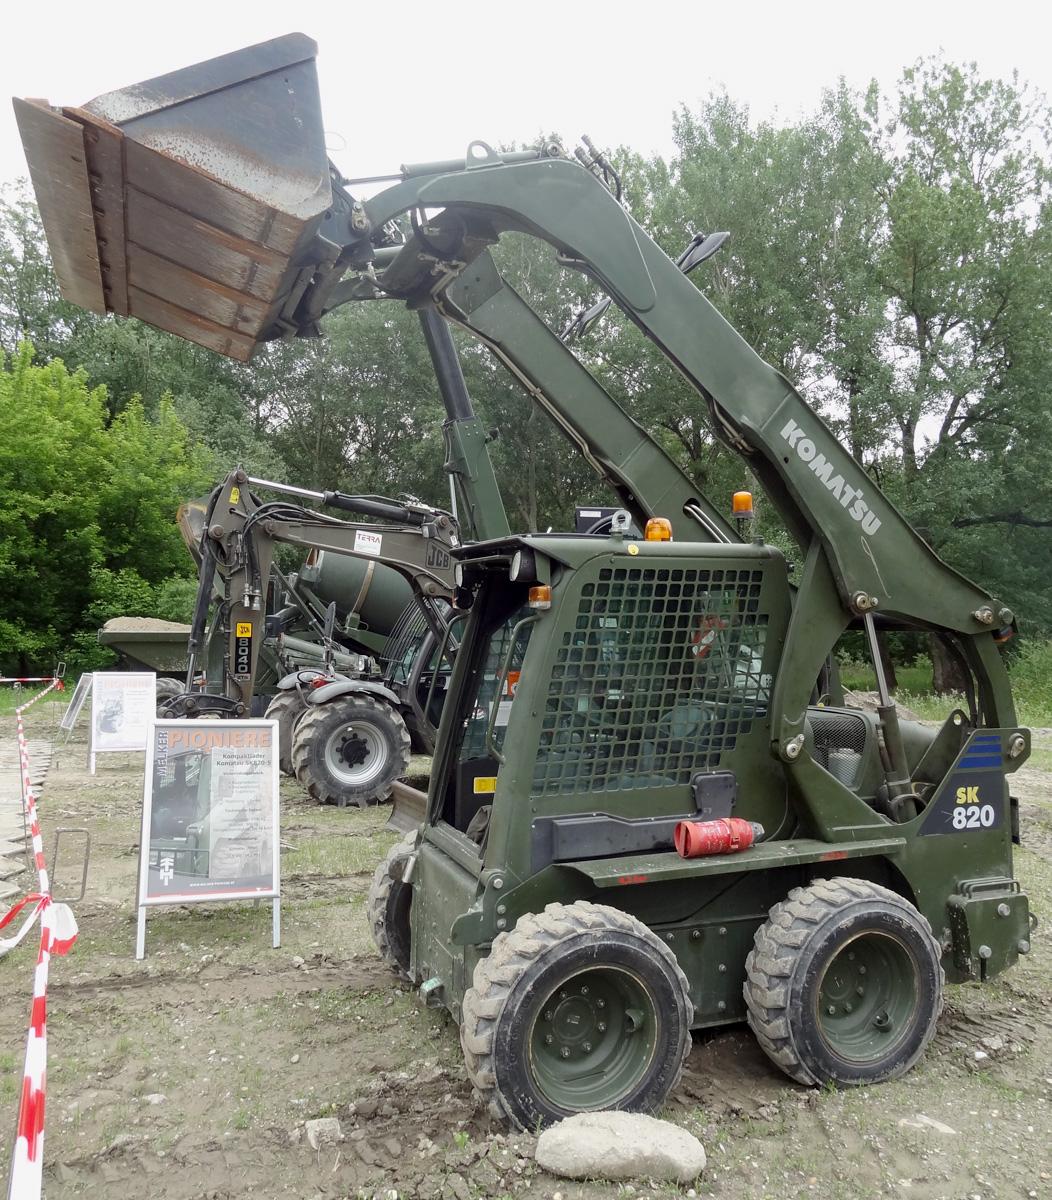 Kompaktlader Komatsu SK820-5 © Doppeladler.com